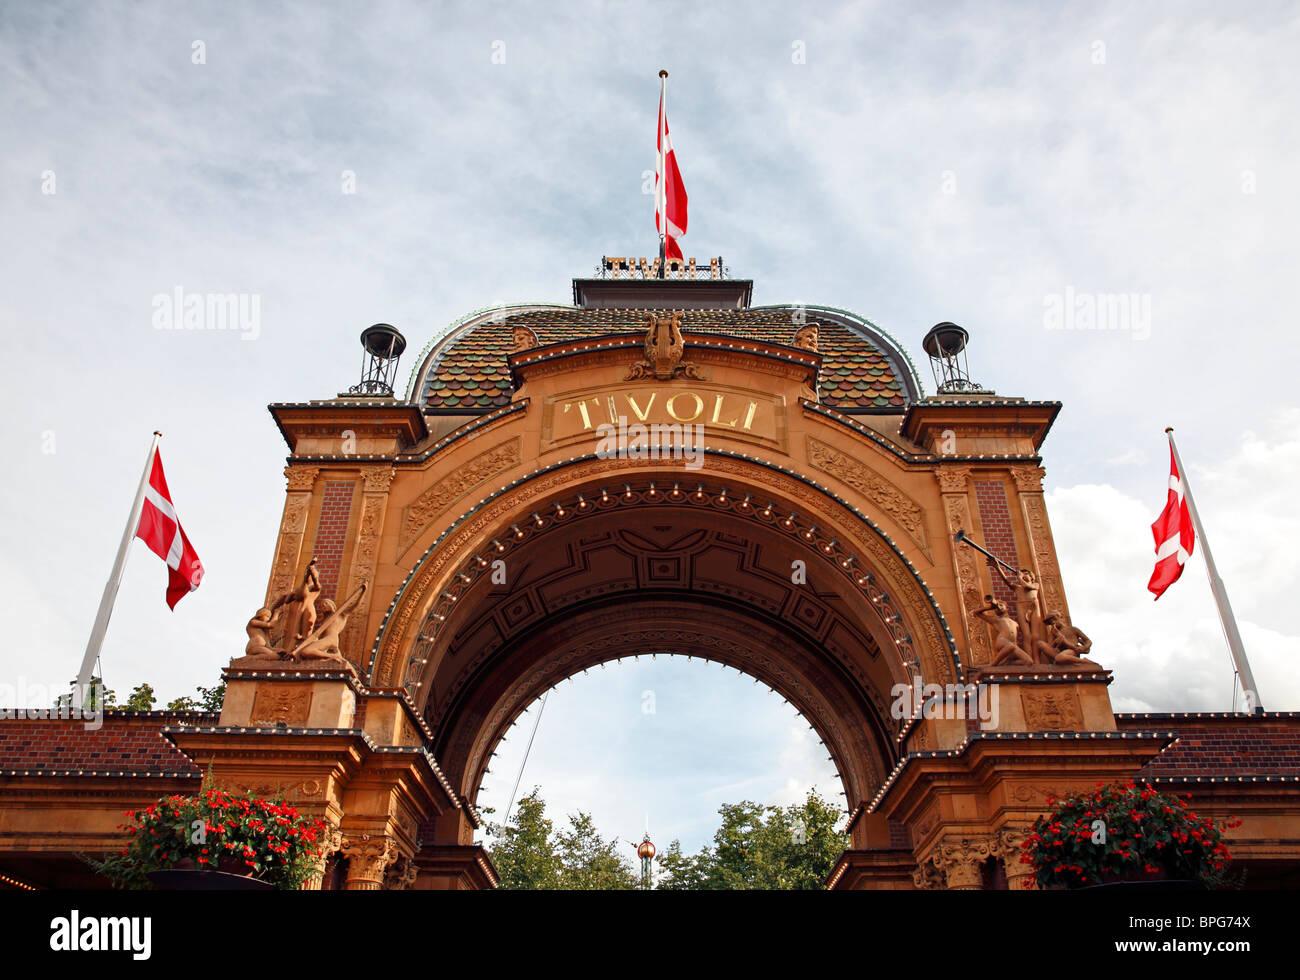 The portal and main entrance to the amusement park Tivoli in Copenhagen, Denmark - Stock Image